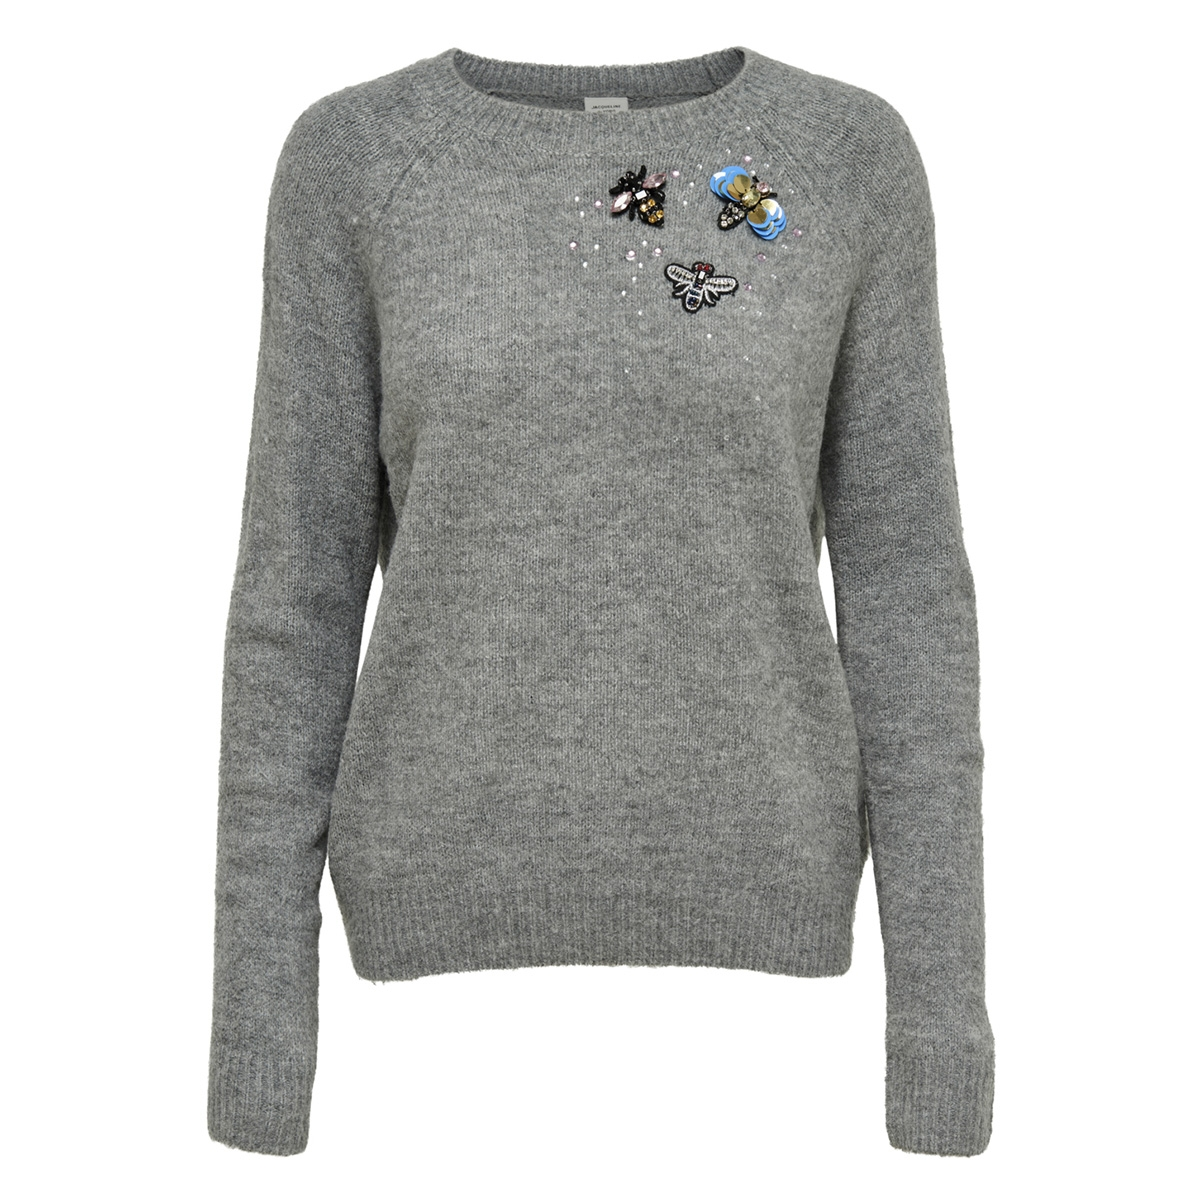 jdydiamond l/s pullover knt 15162979 jacqueline de yong trui dark grey melange/embellishm